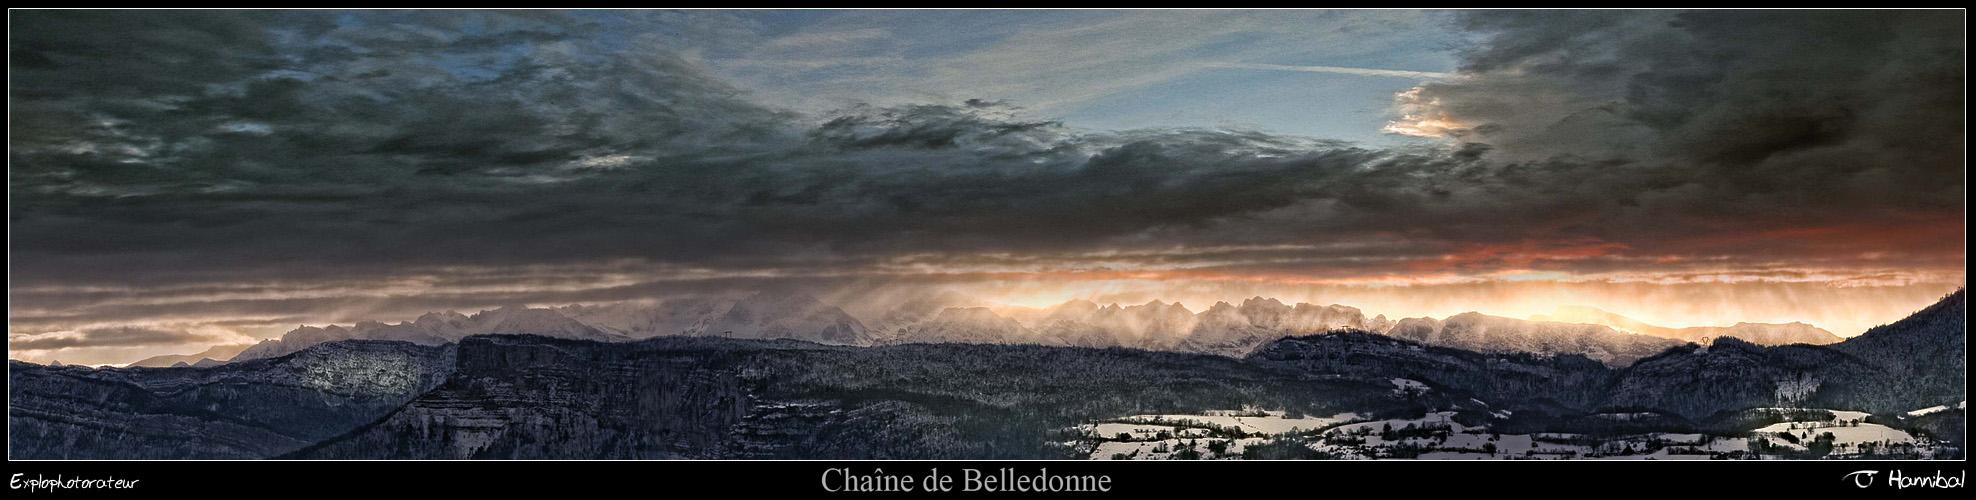 •Chaine de Belledonne•